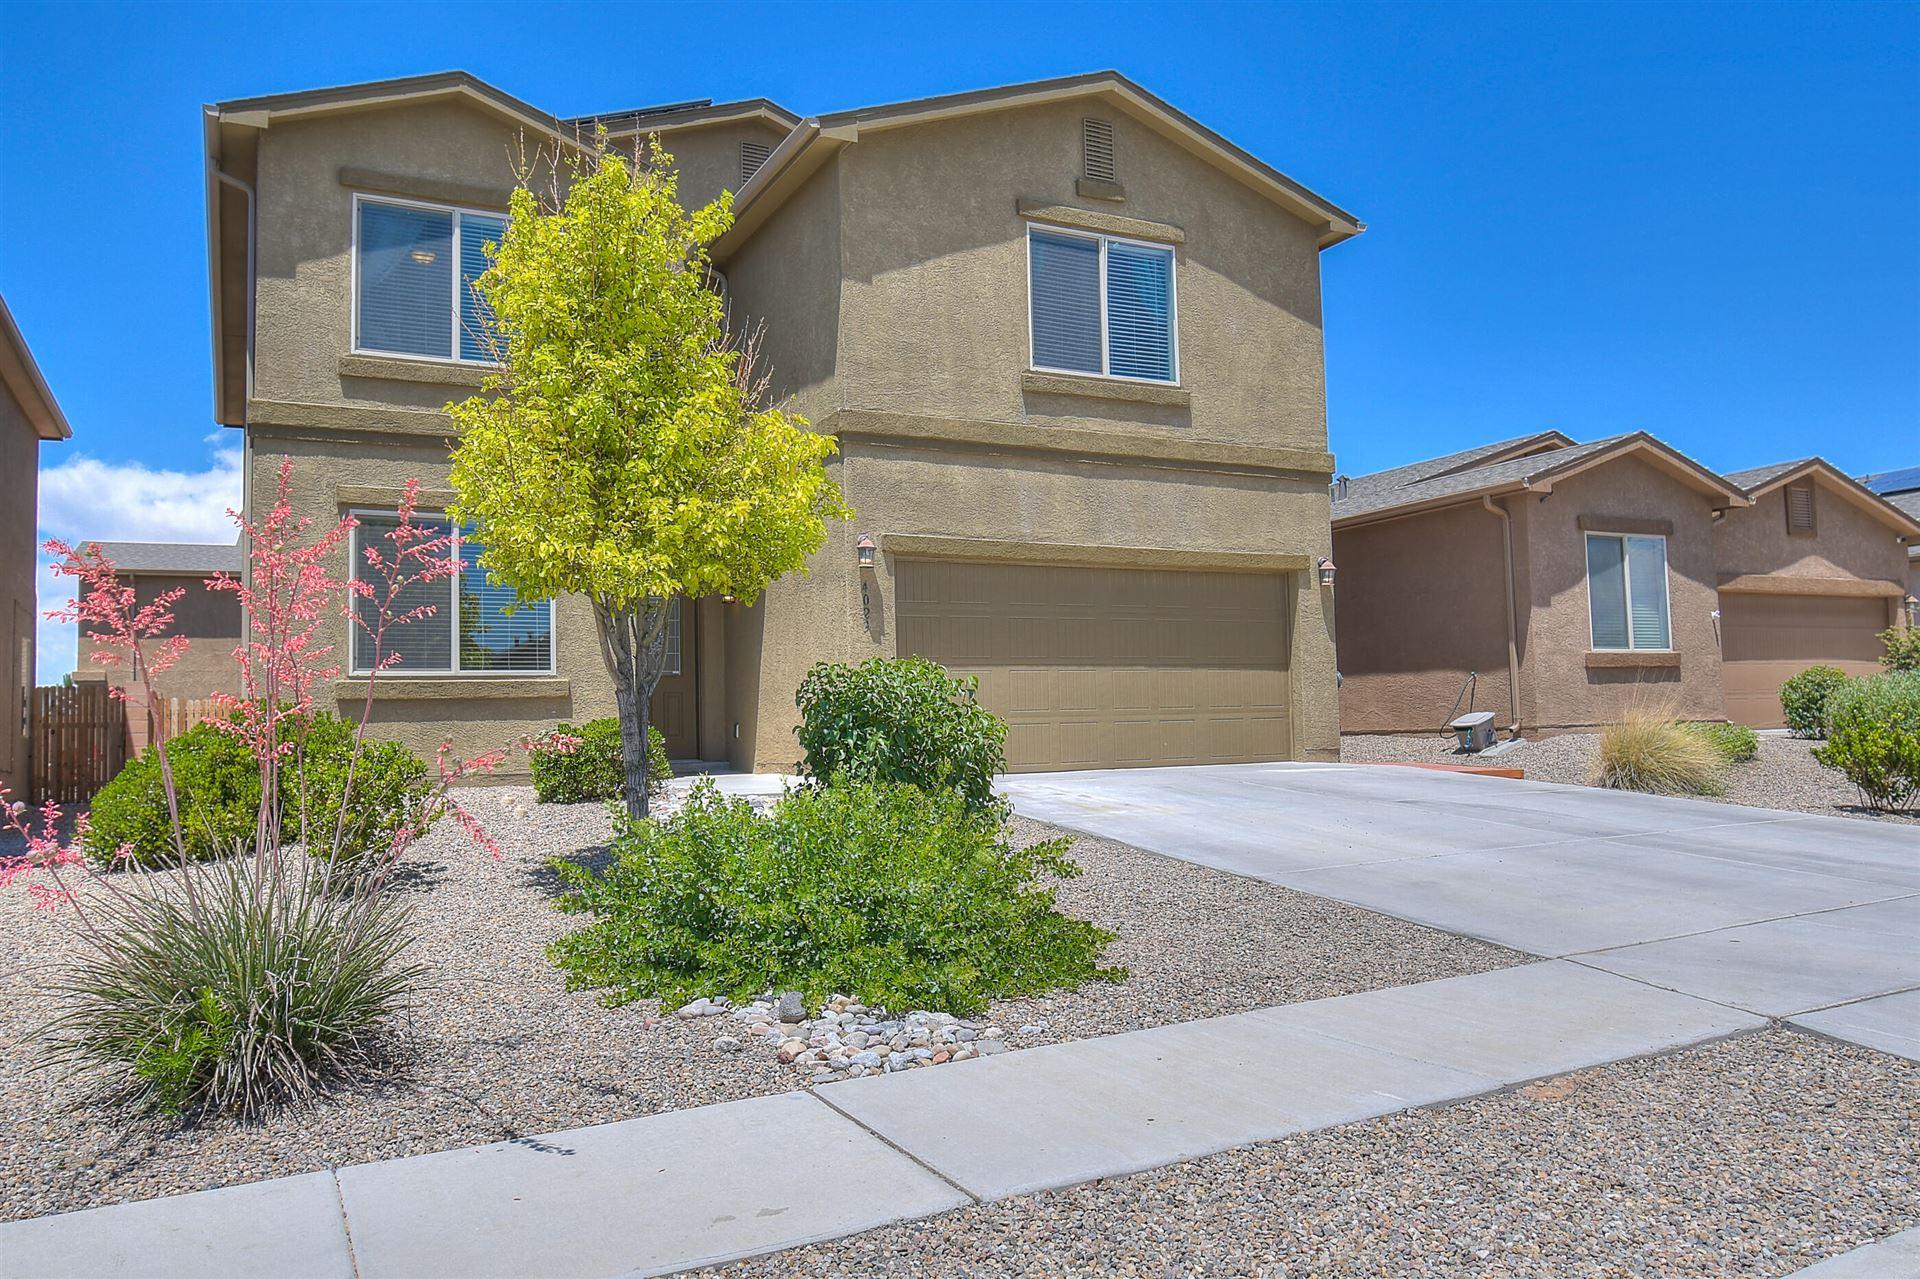 Photo of 4023 DESERT LUPINE Drive NE, Rio Rancho, NM 87144 (MLS # 971311)